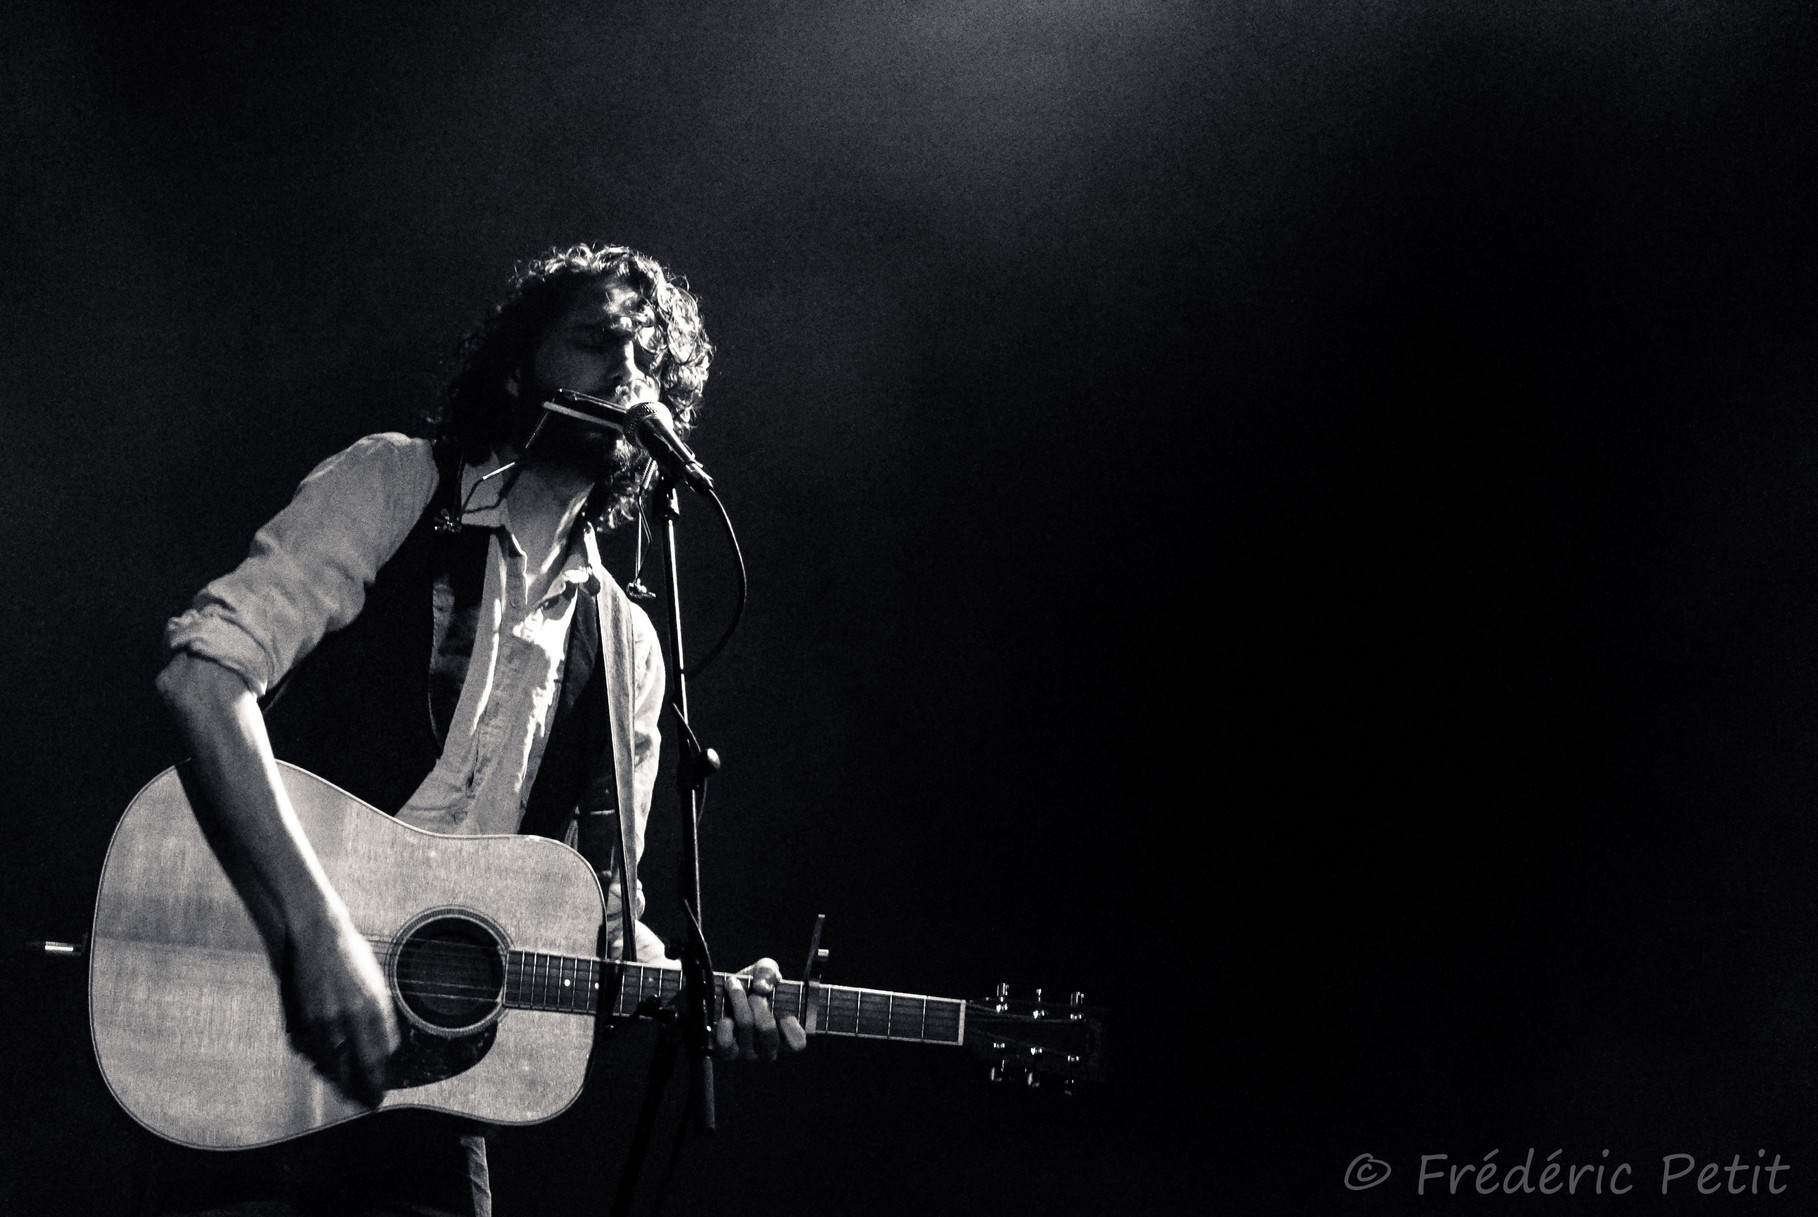 15 octobre 2013 - Alexandre Poulin @ 3 Baudets